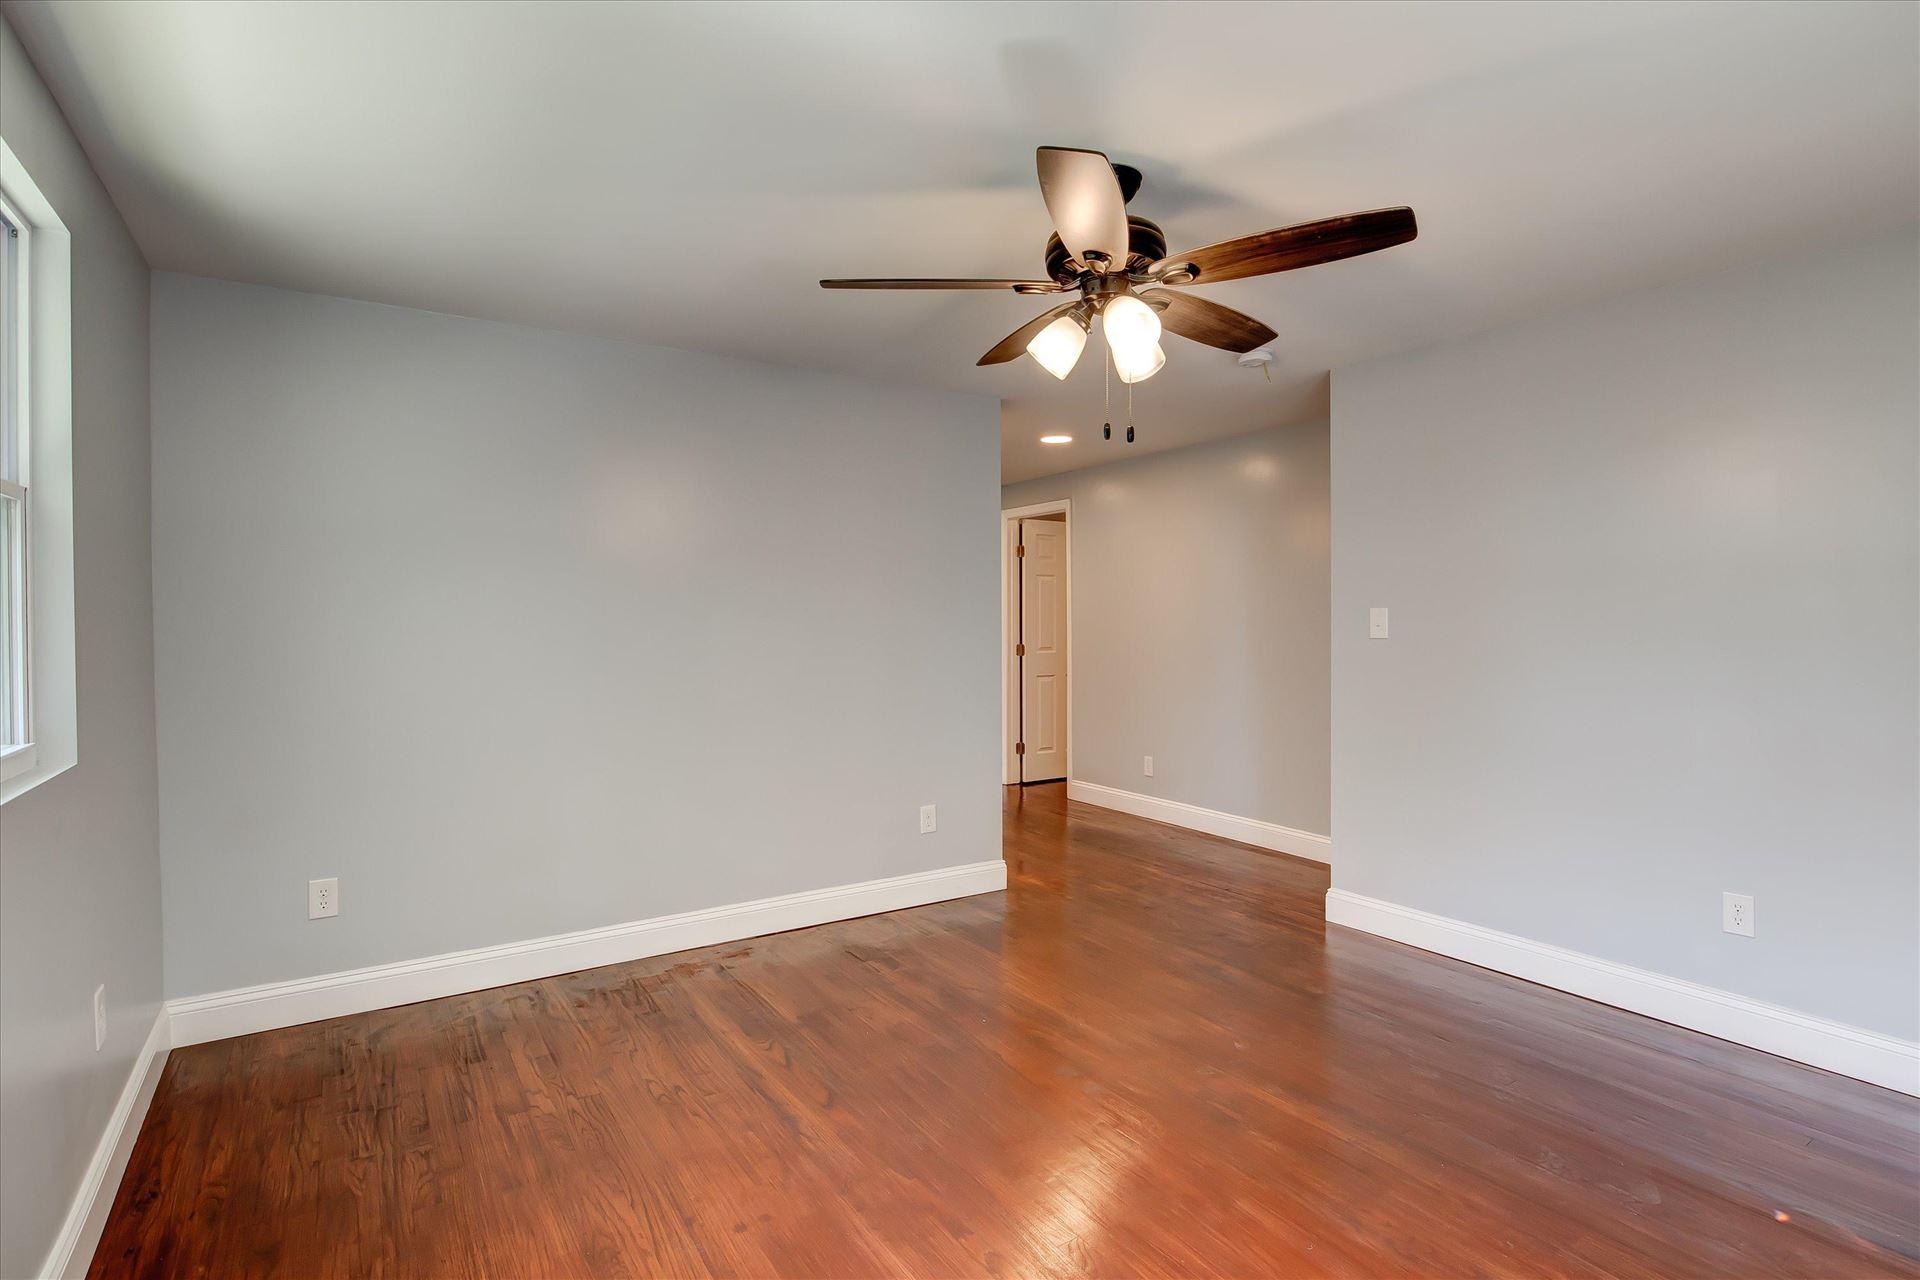 Photo of 606 Reed Drive, Powell, TN 37849 (MLS # 1163956)